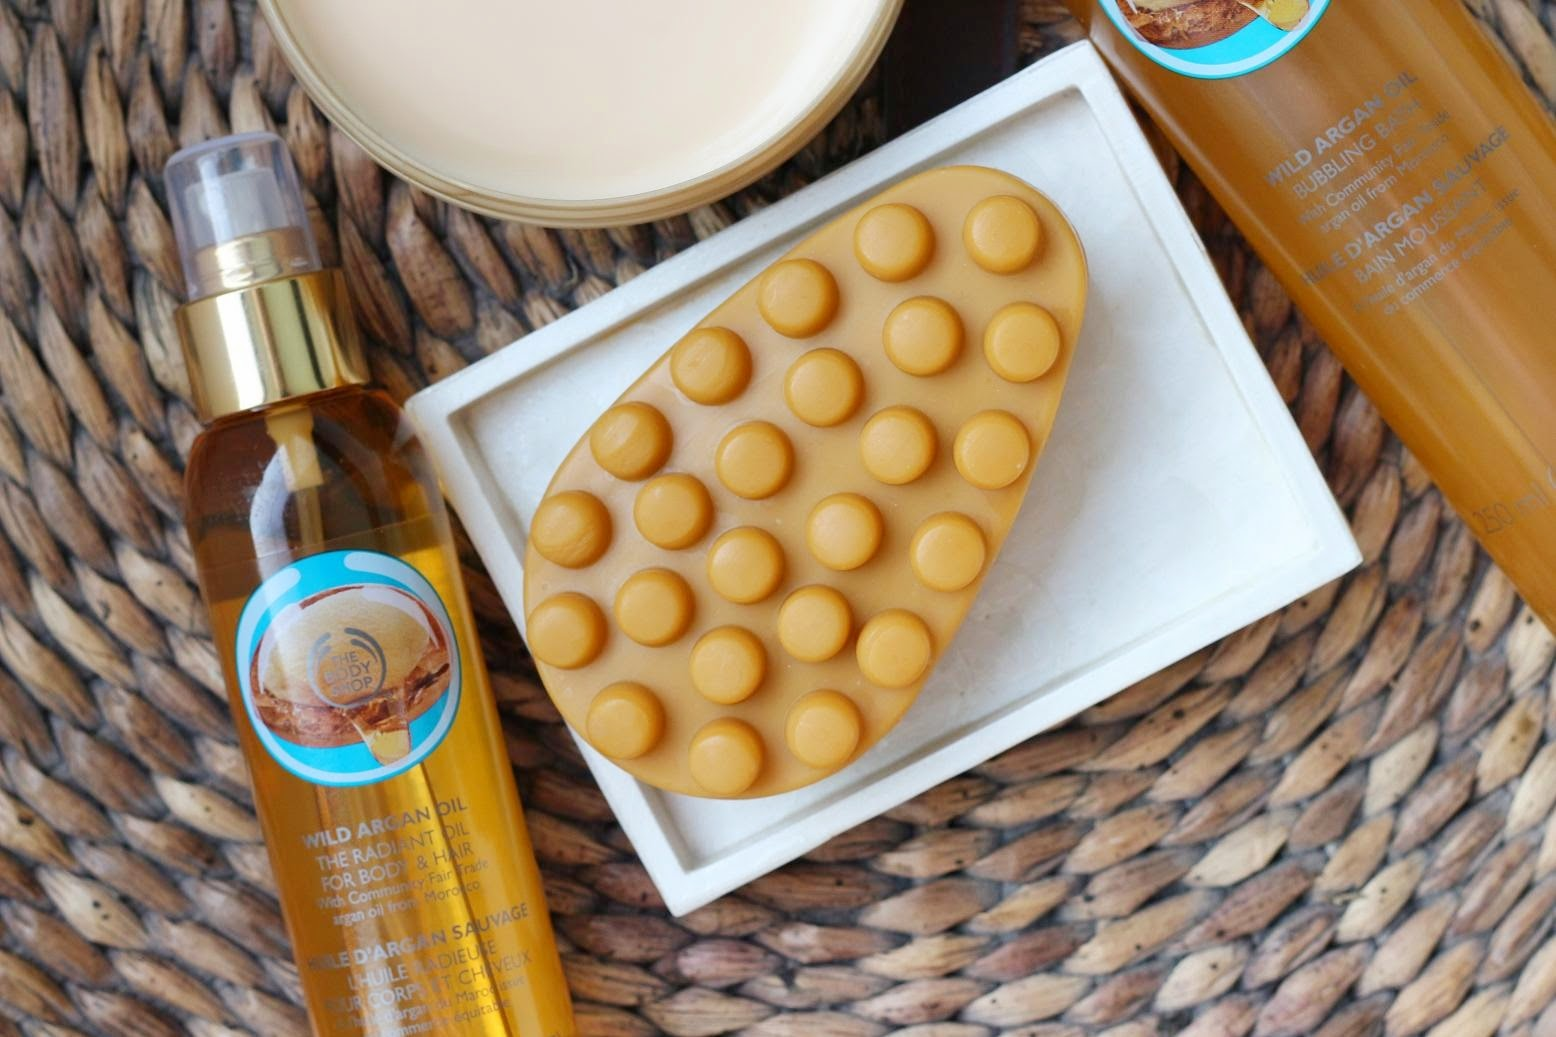 The Body Shop Wild Argan Oil